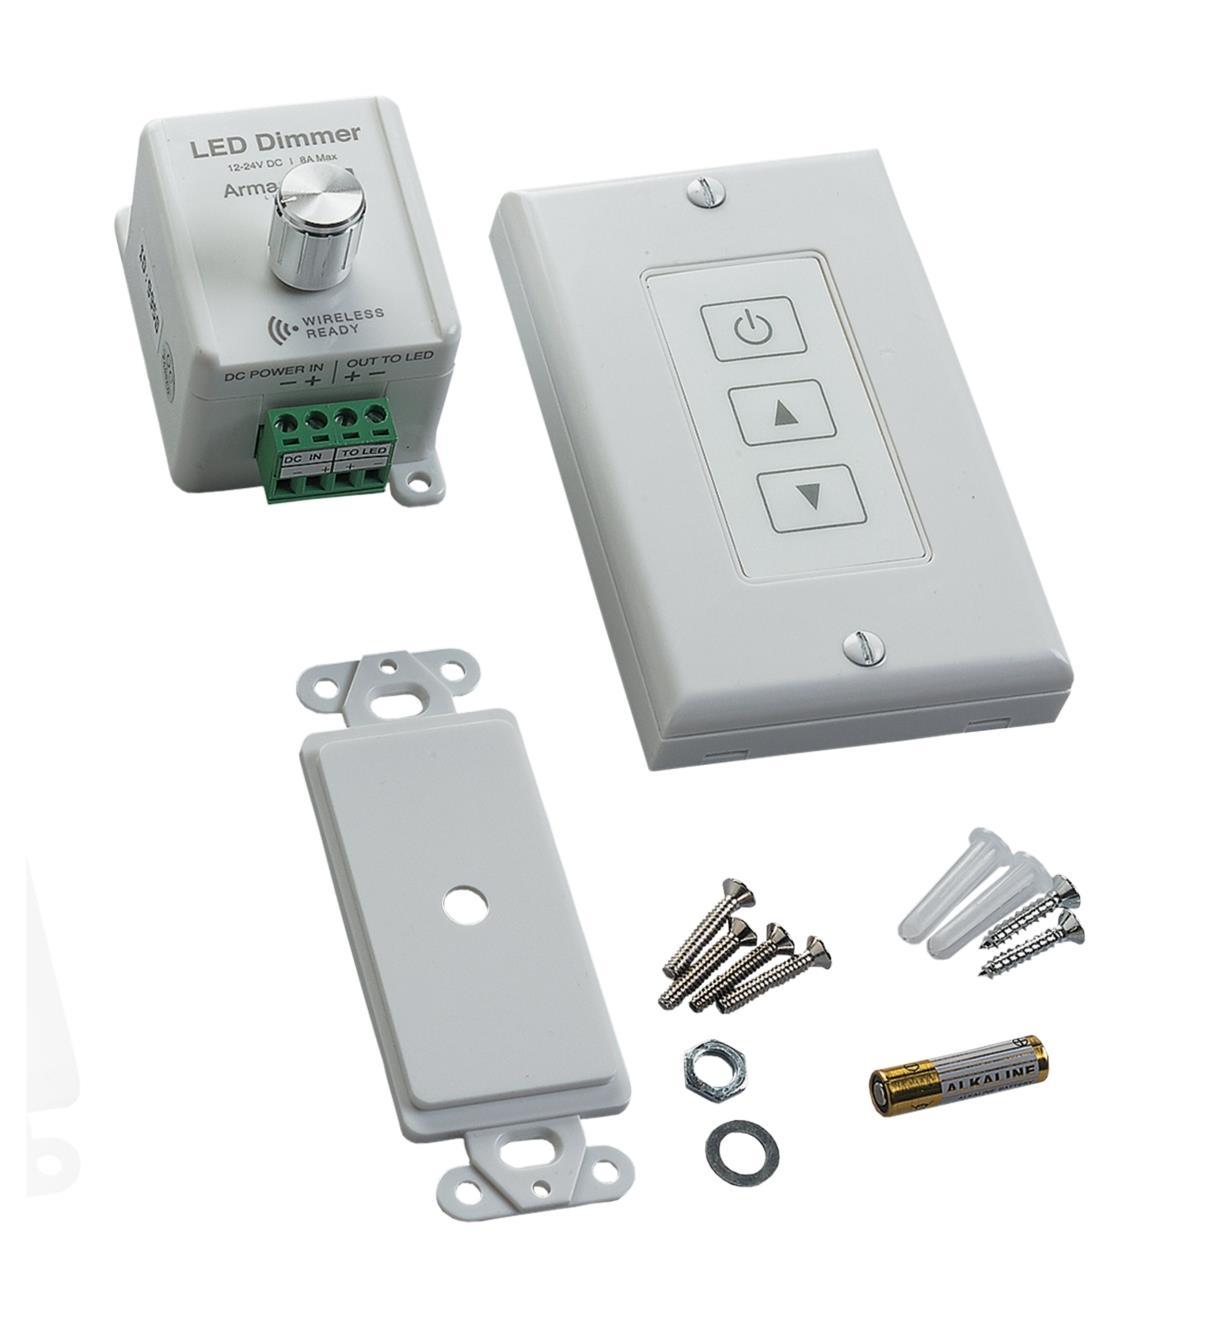 00U4210 - Dimmer w/Wireless Touchpad